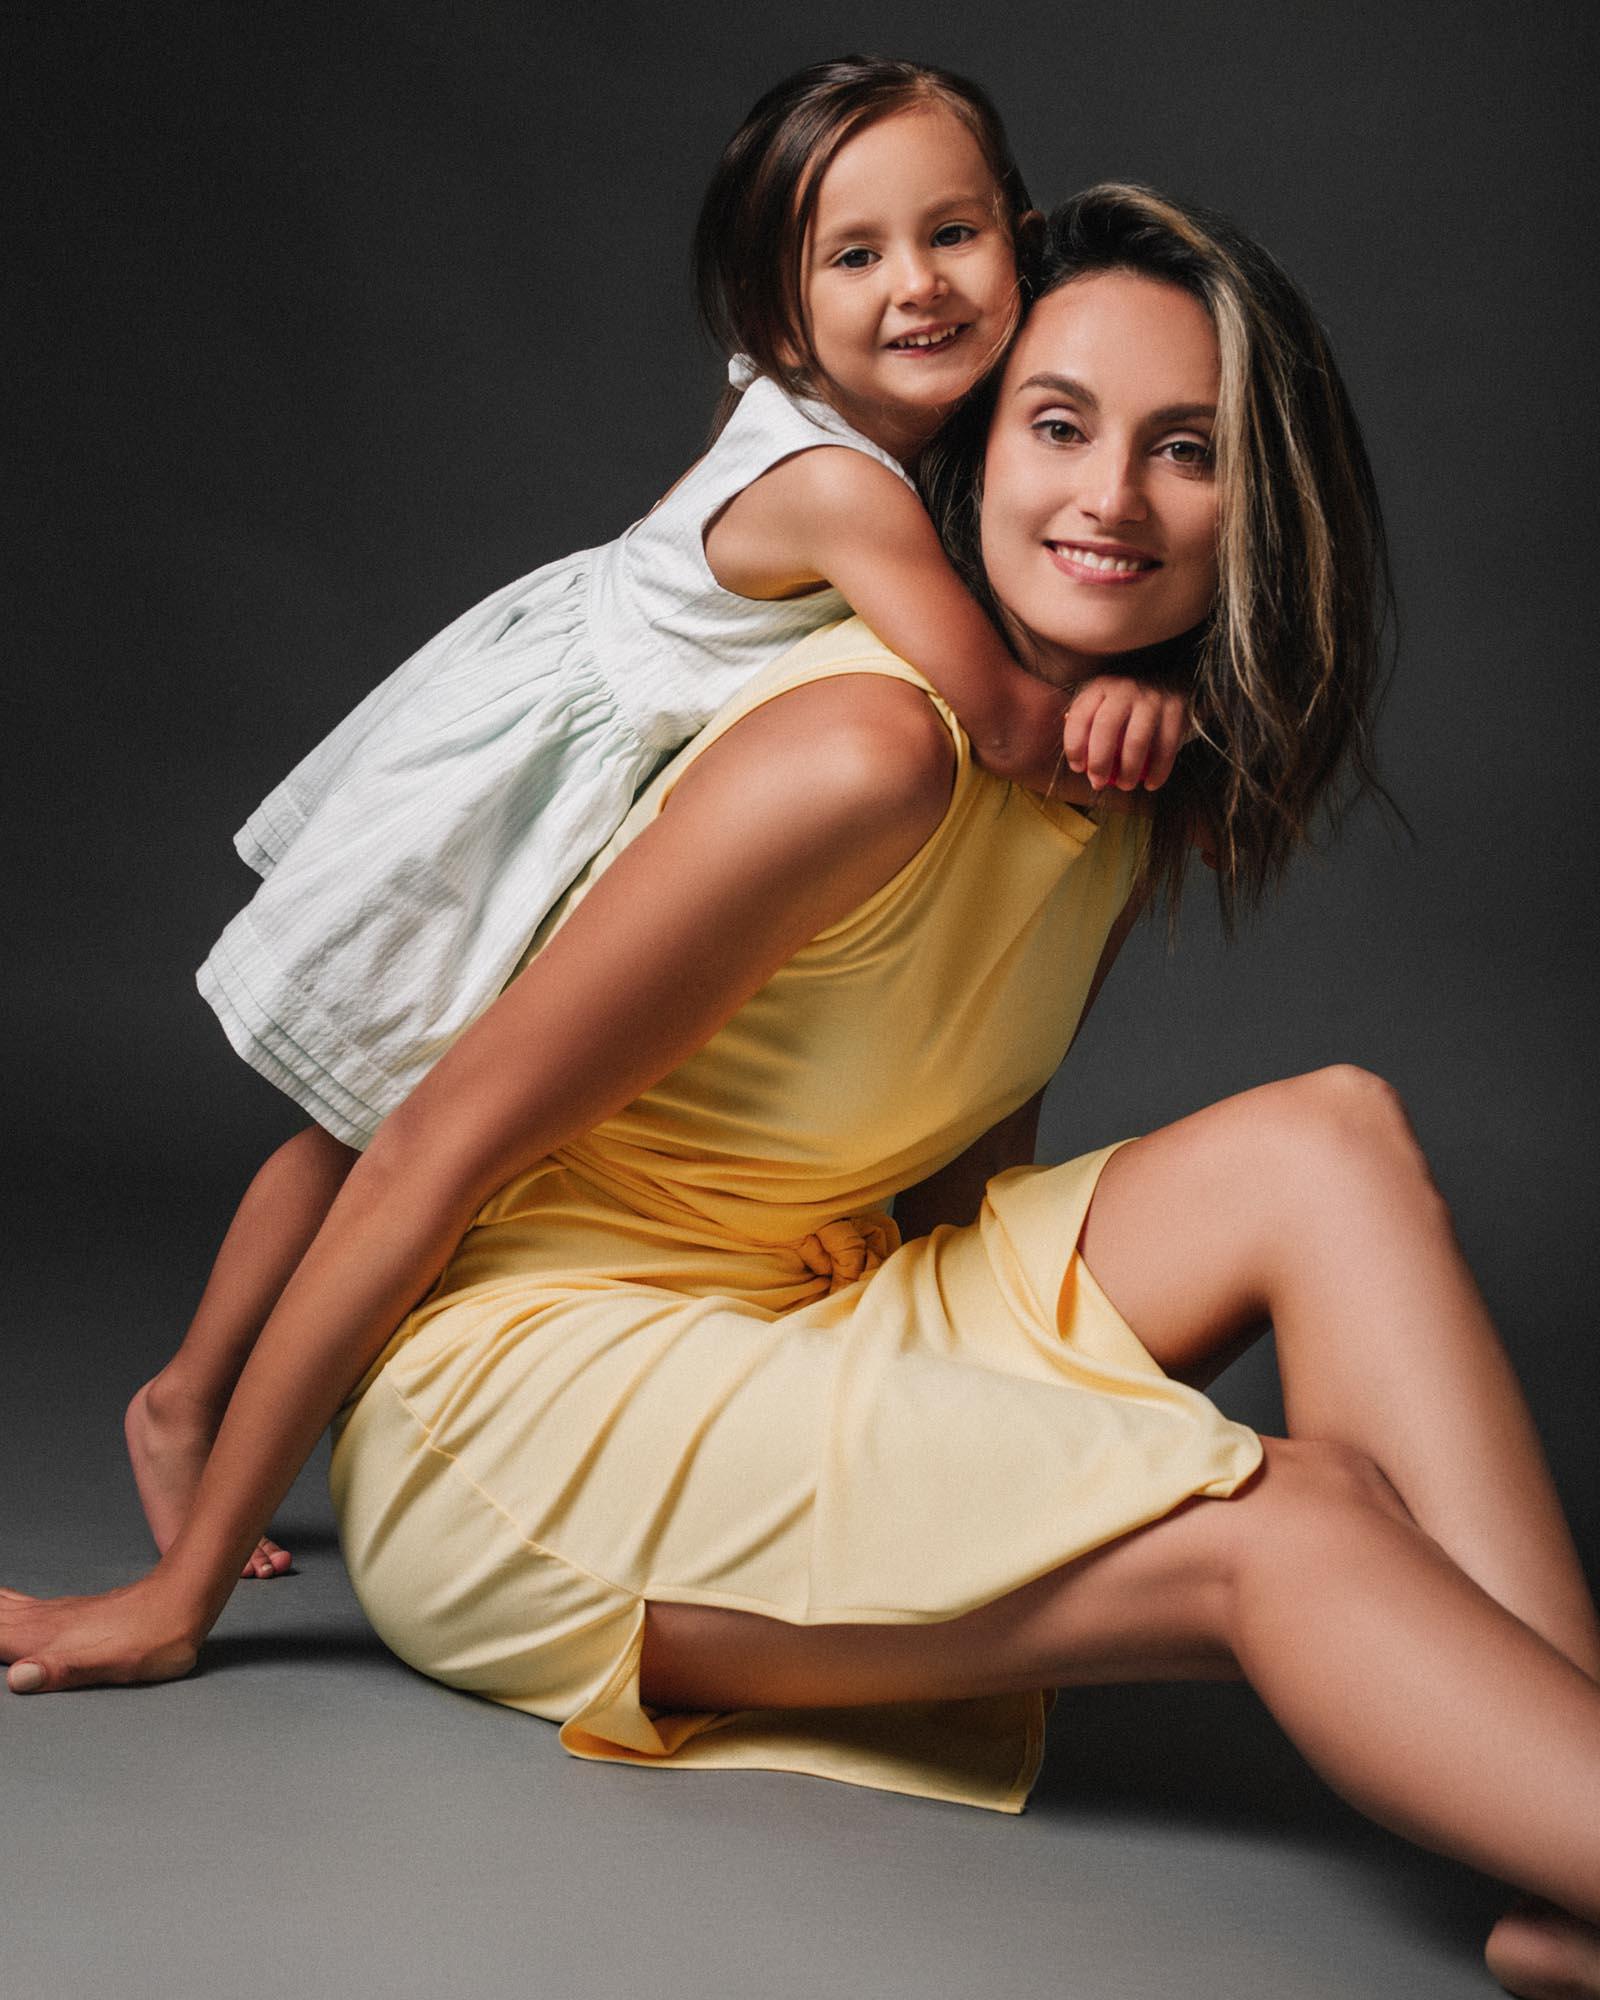 nyc-photographers-FAMILY-PHOTOSHOOT-10027.jpg